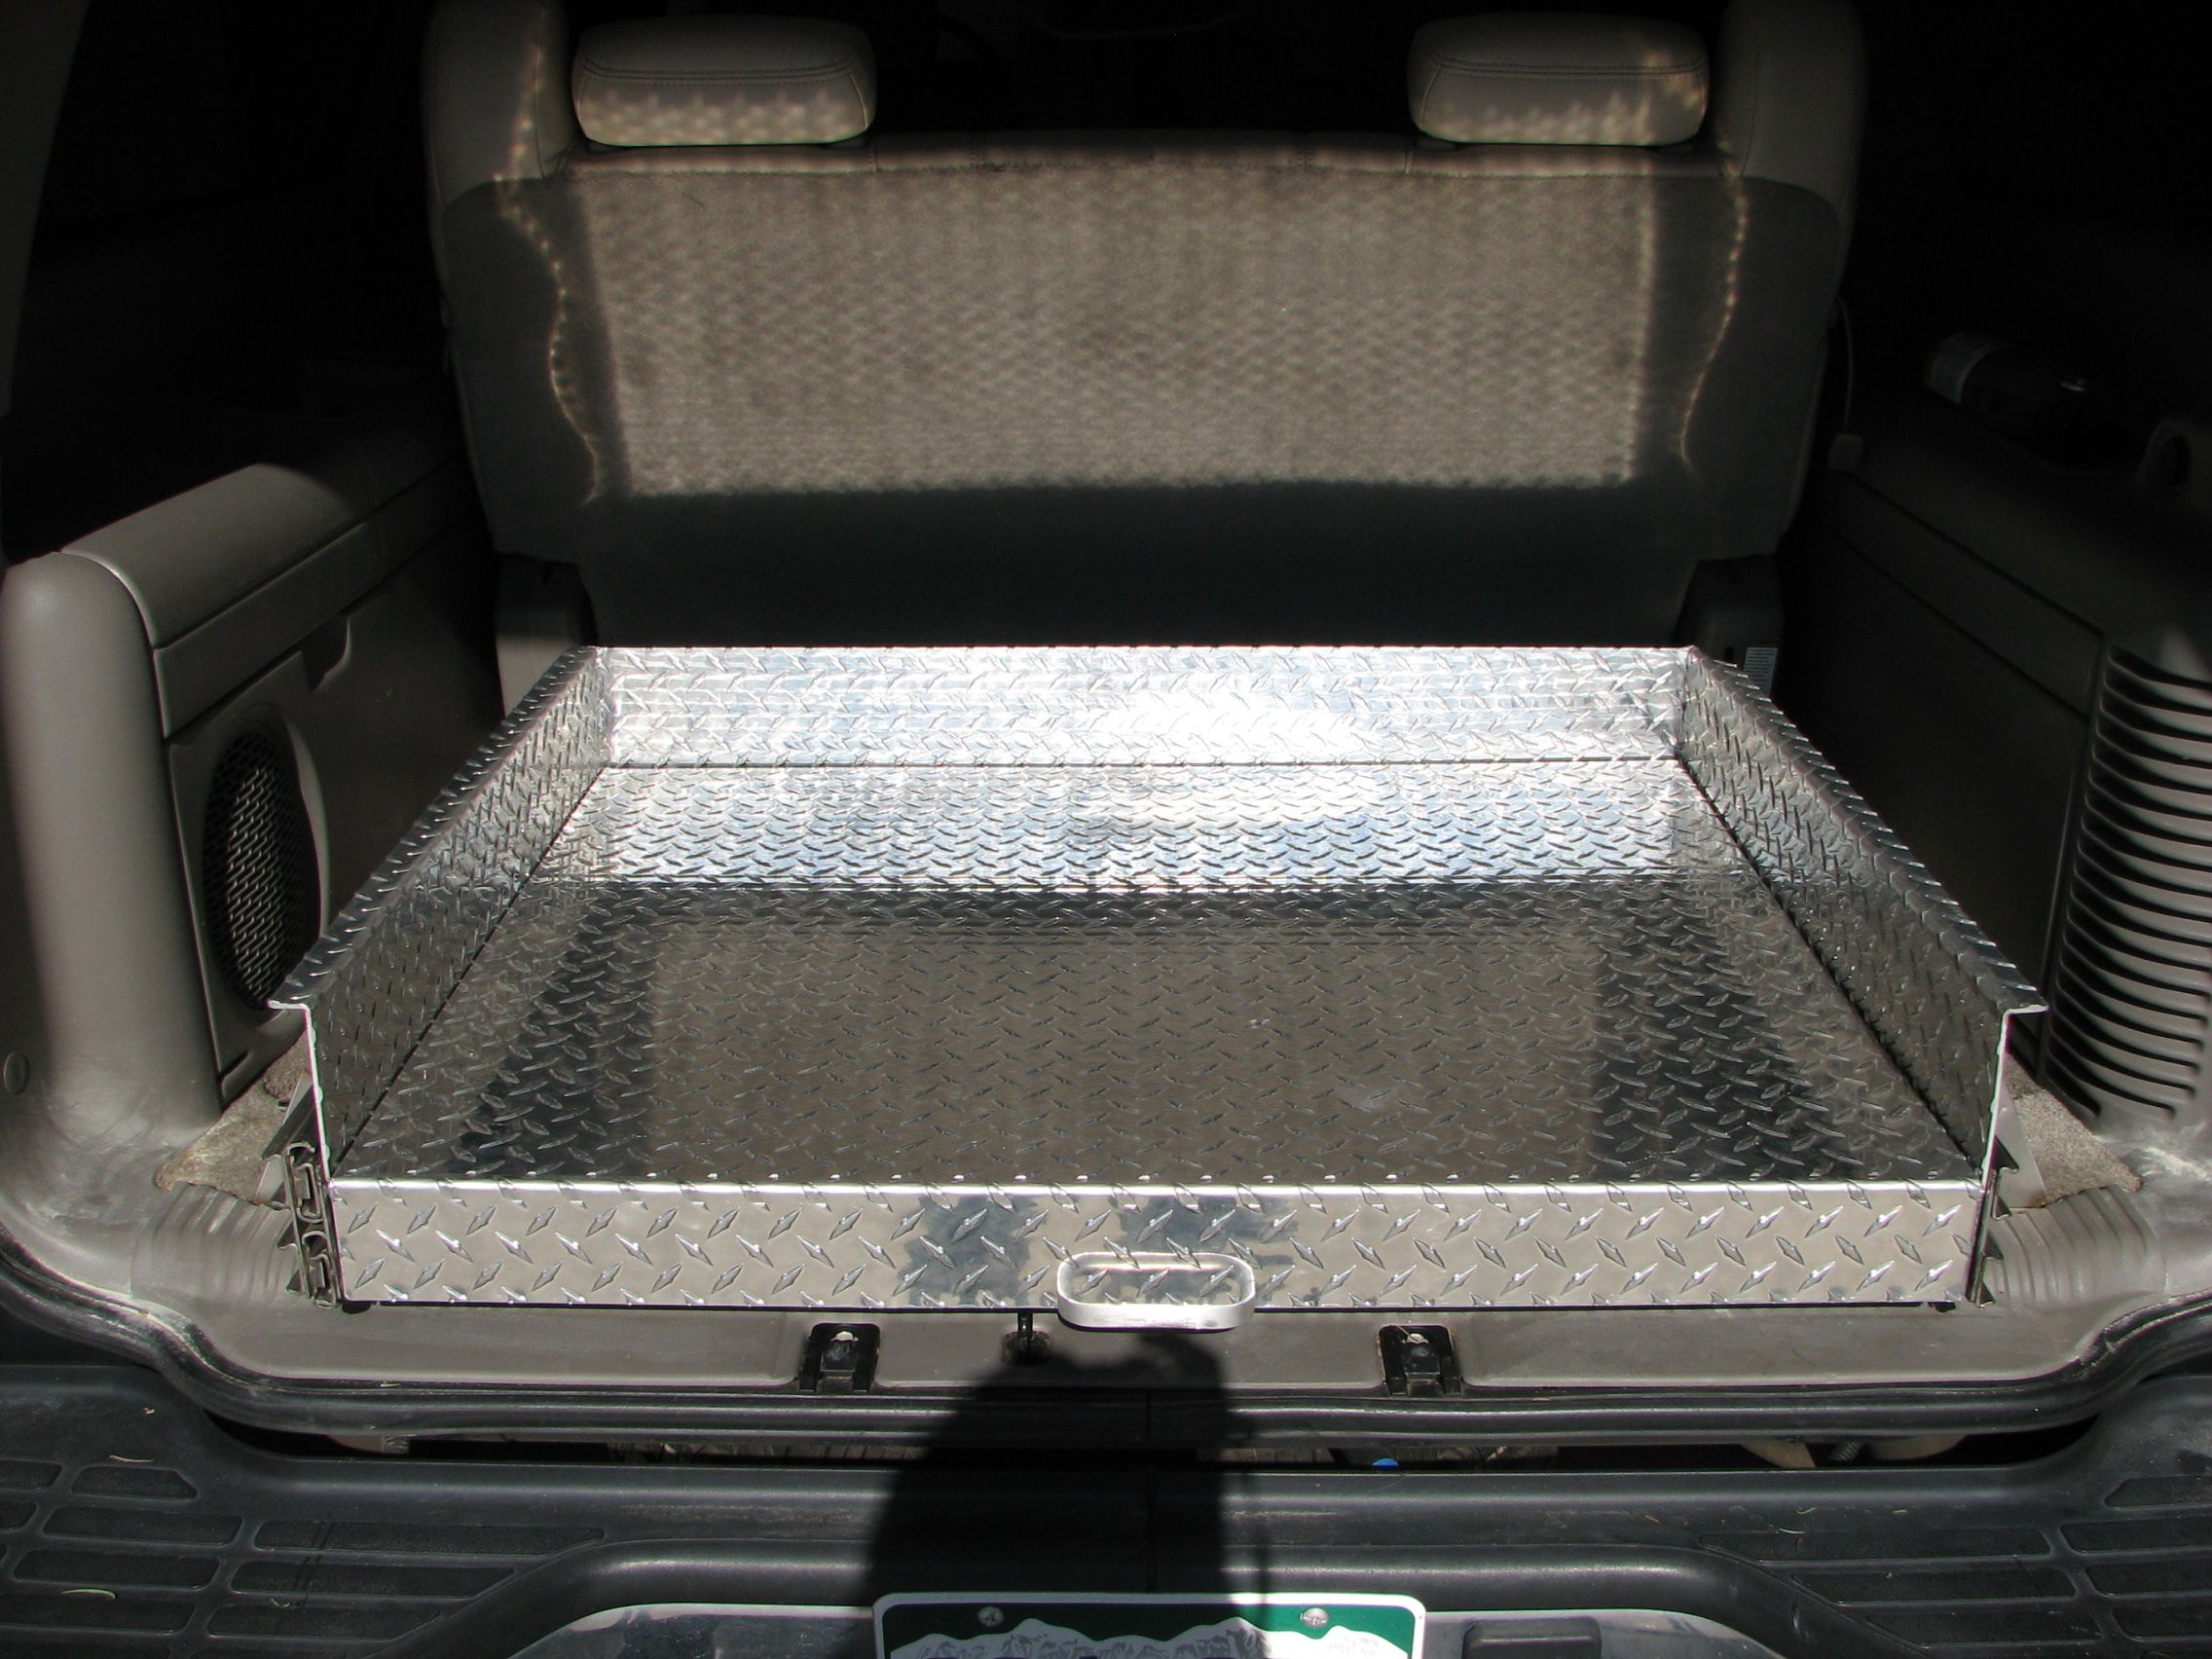 IMG_1099.JPG (2272×1704) Truck bed accessories, Truck